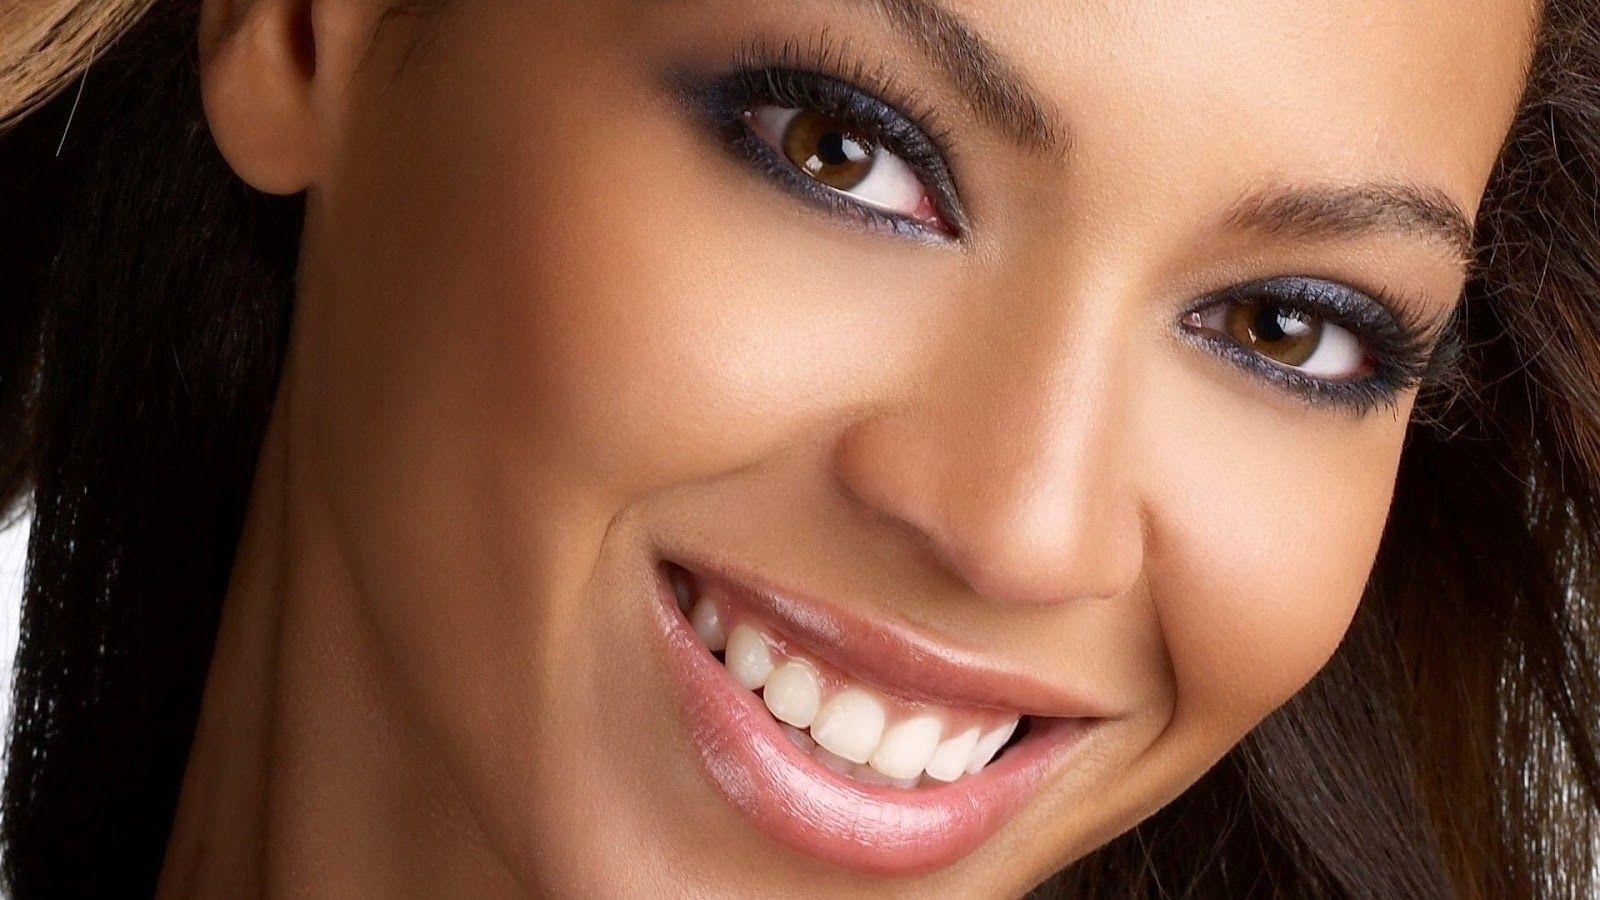 Beautiful Smile Wallpaper 68 Images: Beyonce Beautiful Smile